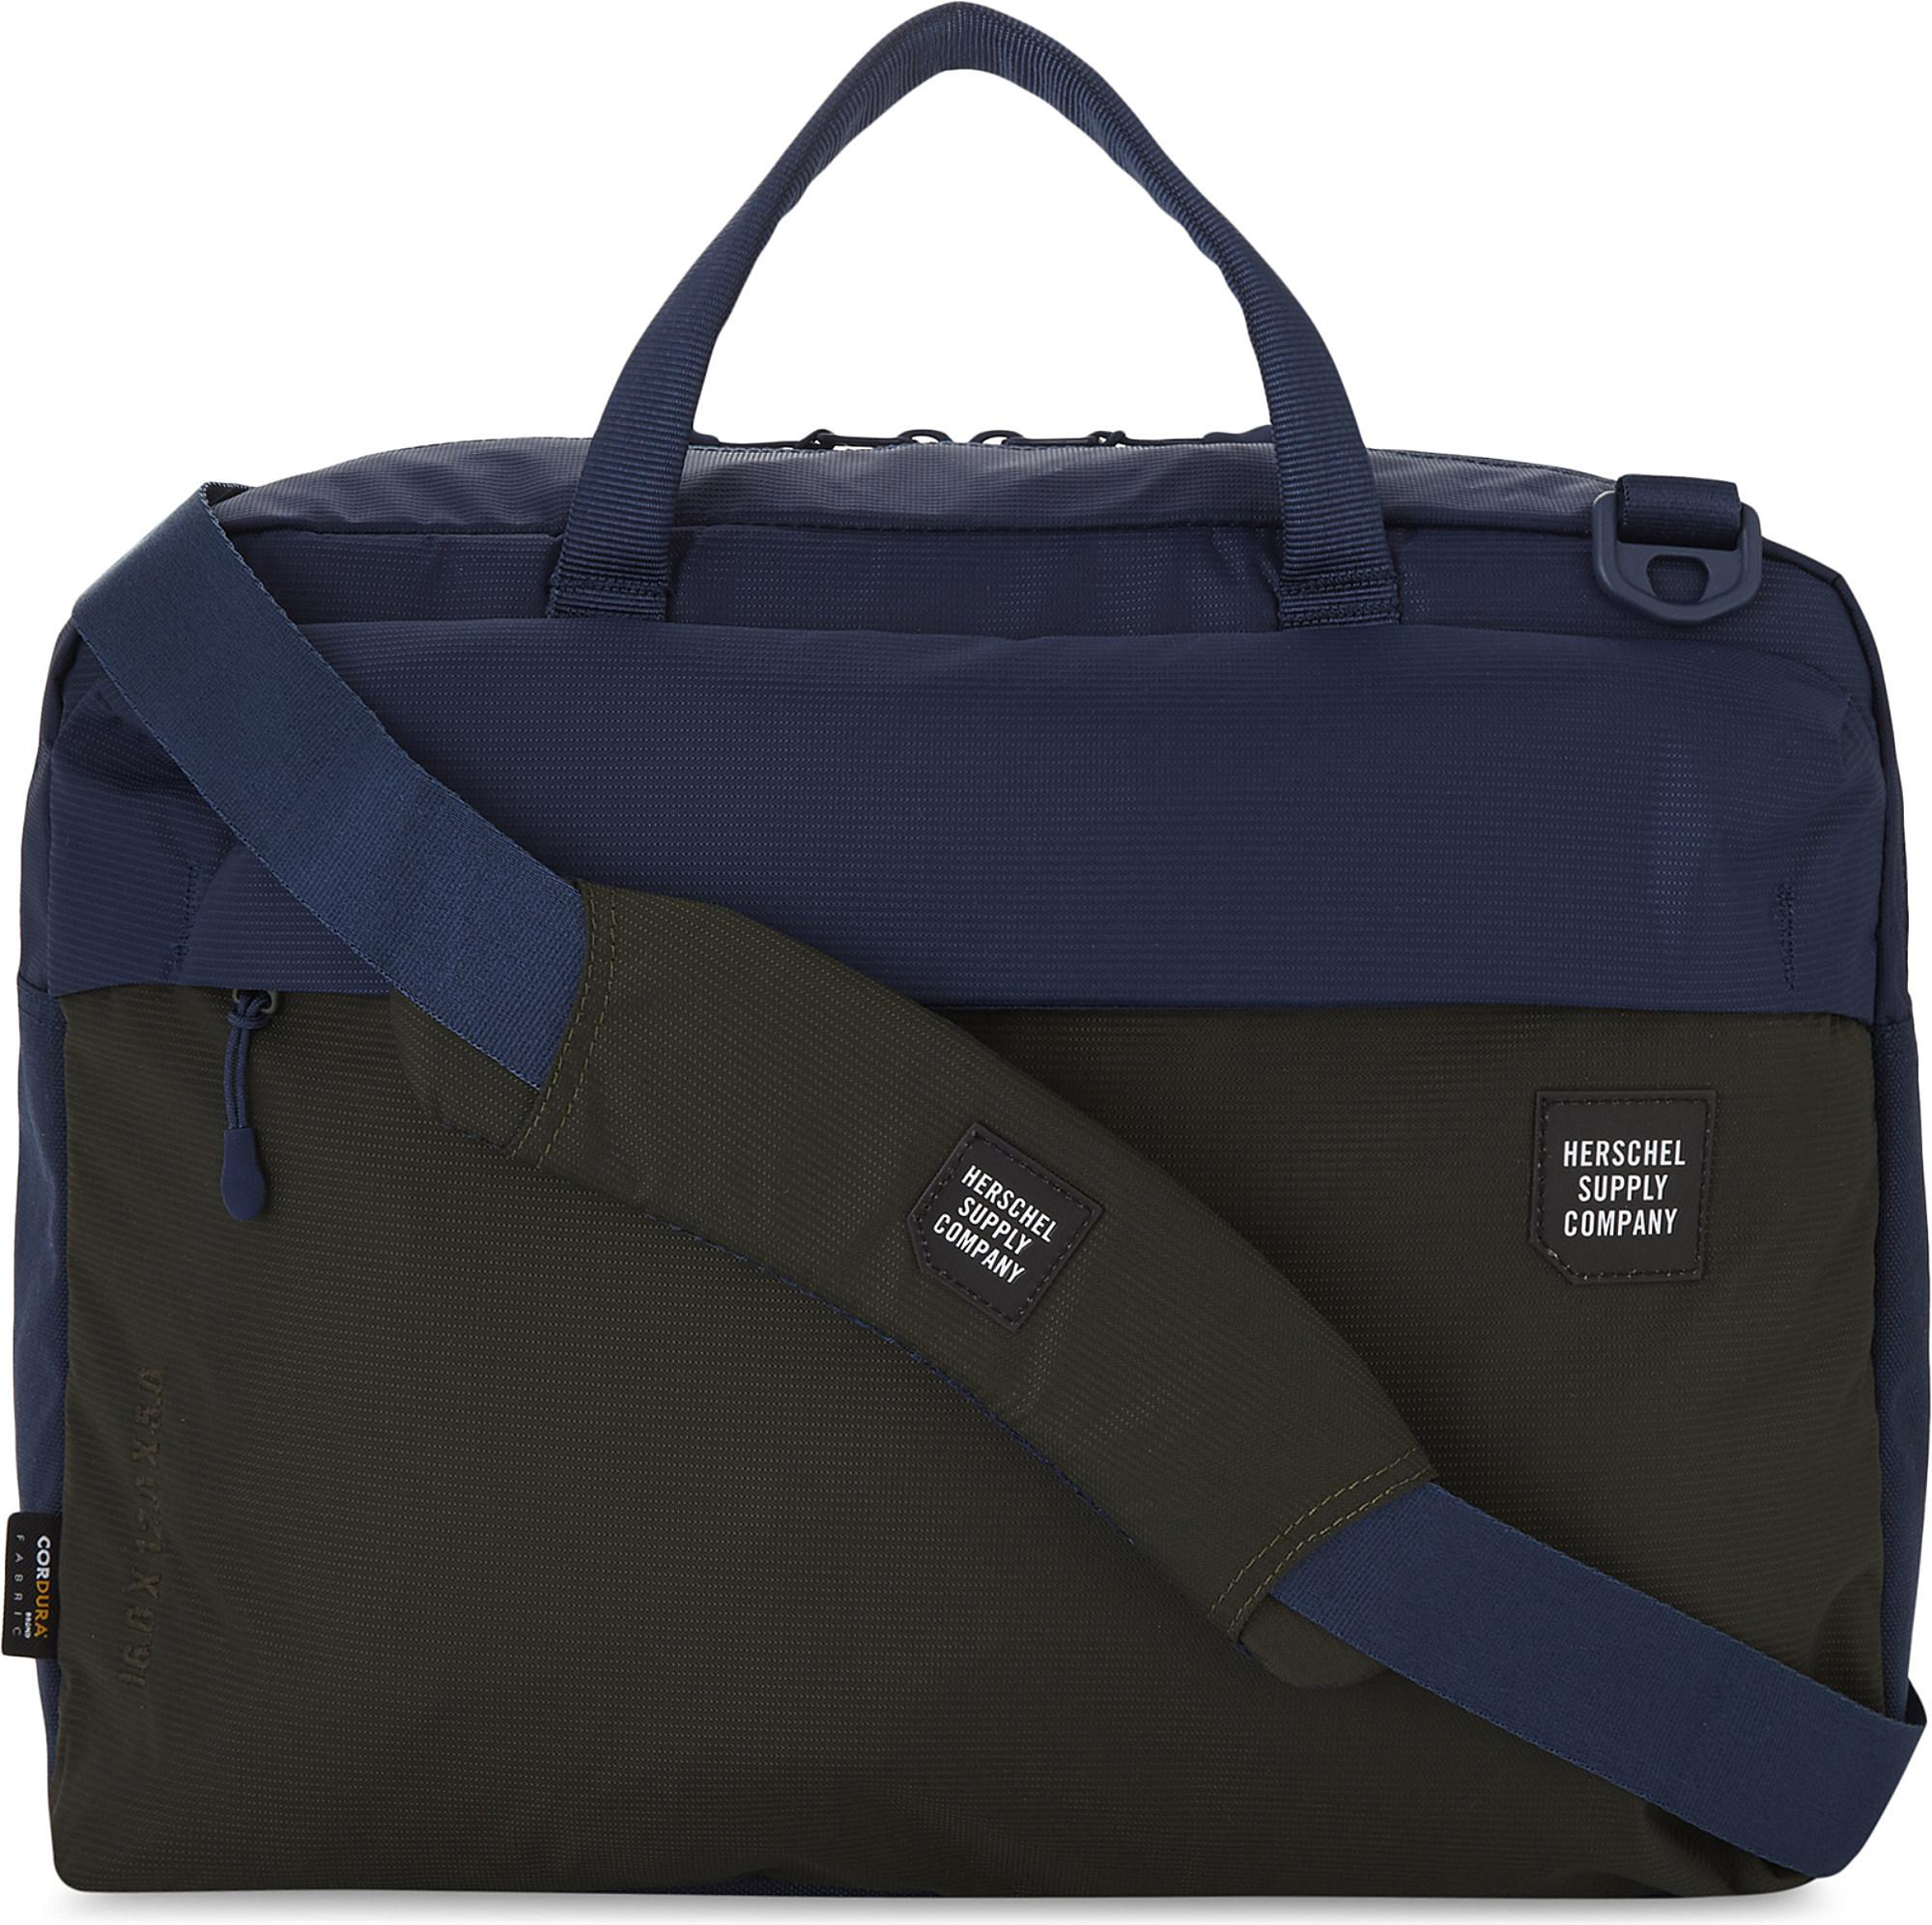 b2c1586aa22 Herschel Supply Co. Britannia Two-tone Messenger Bag in Blue - Lyst